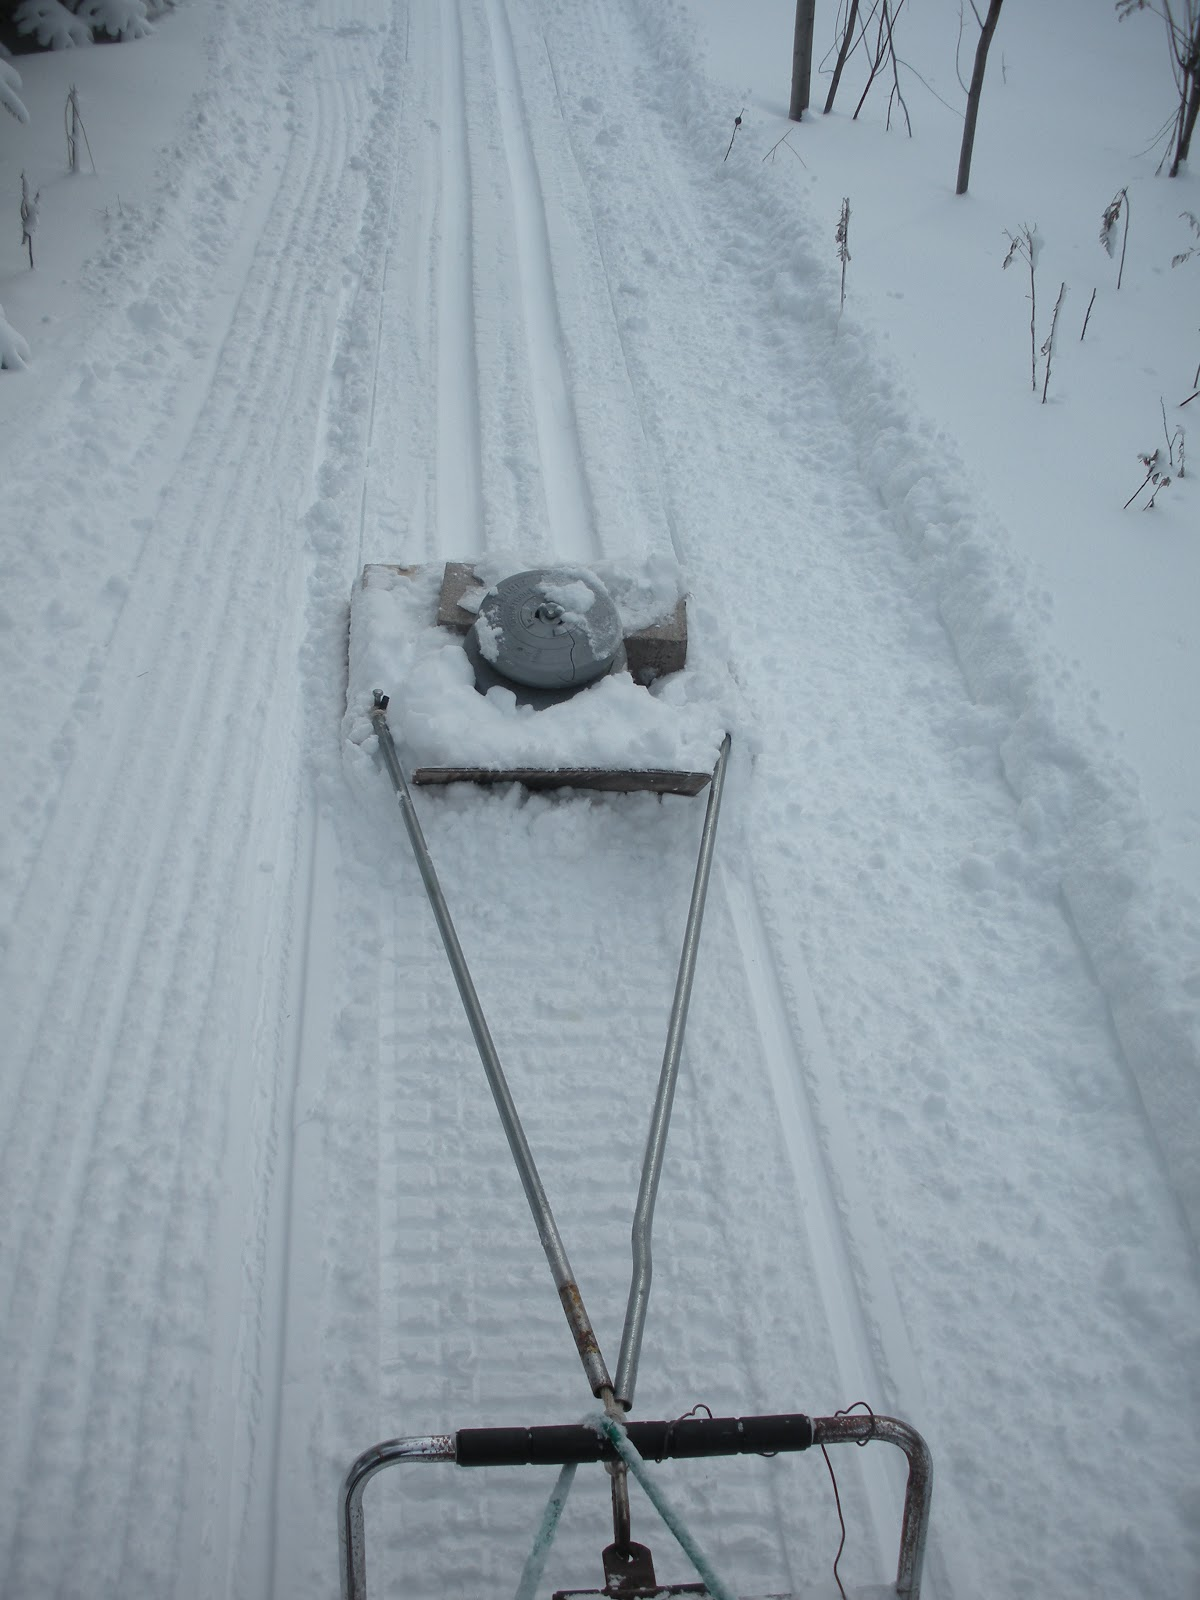 Forbush Corner widens trail for new groomer - NordicSkiRacer  Cross Country Ski Trail Grooming